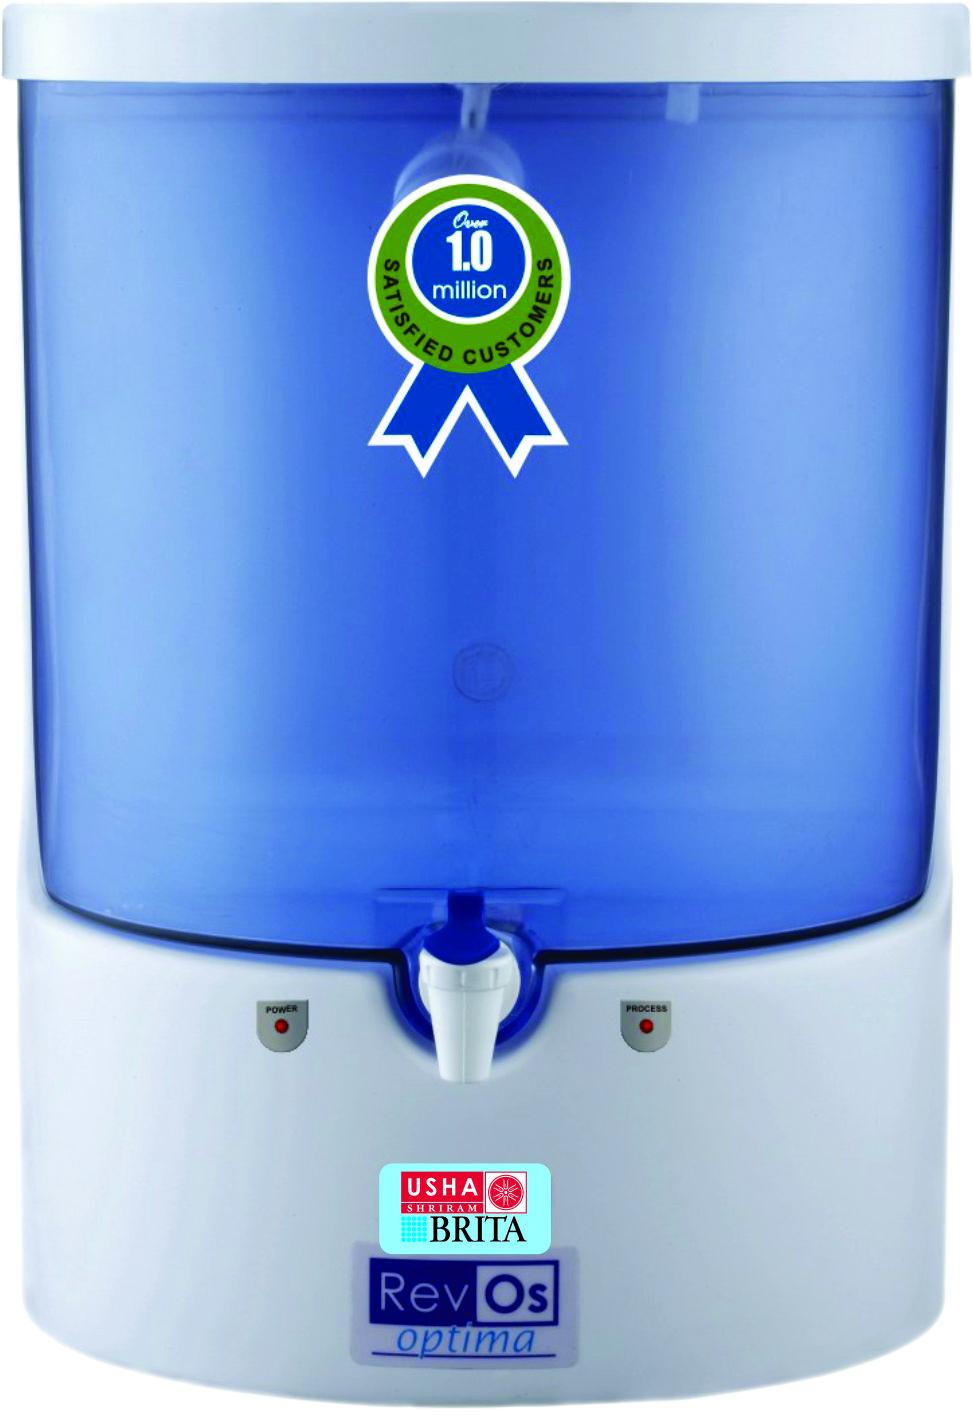 89f93e0d1 USHA BRITA RO OPTIMA WATER PURIFIER Reviews